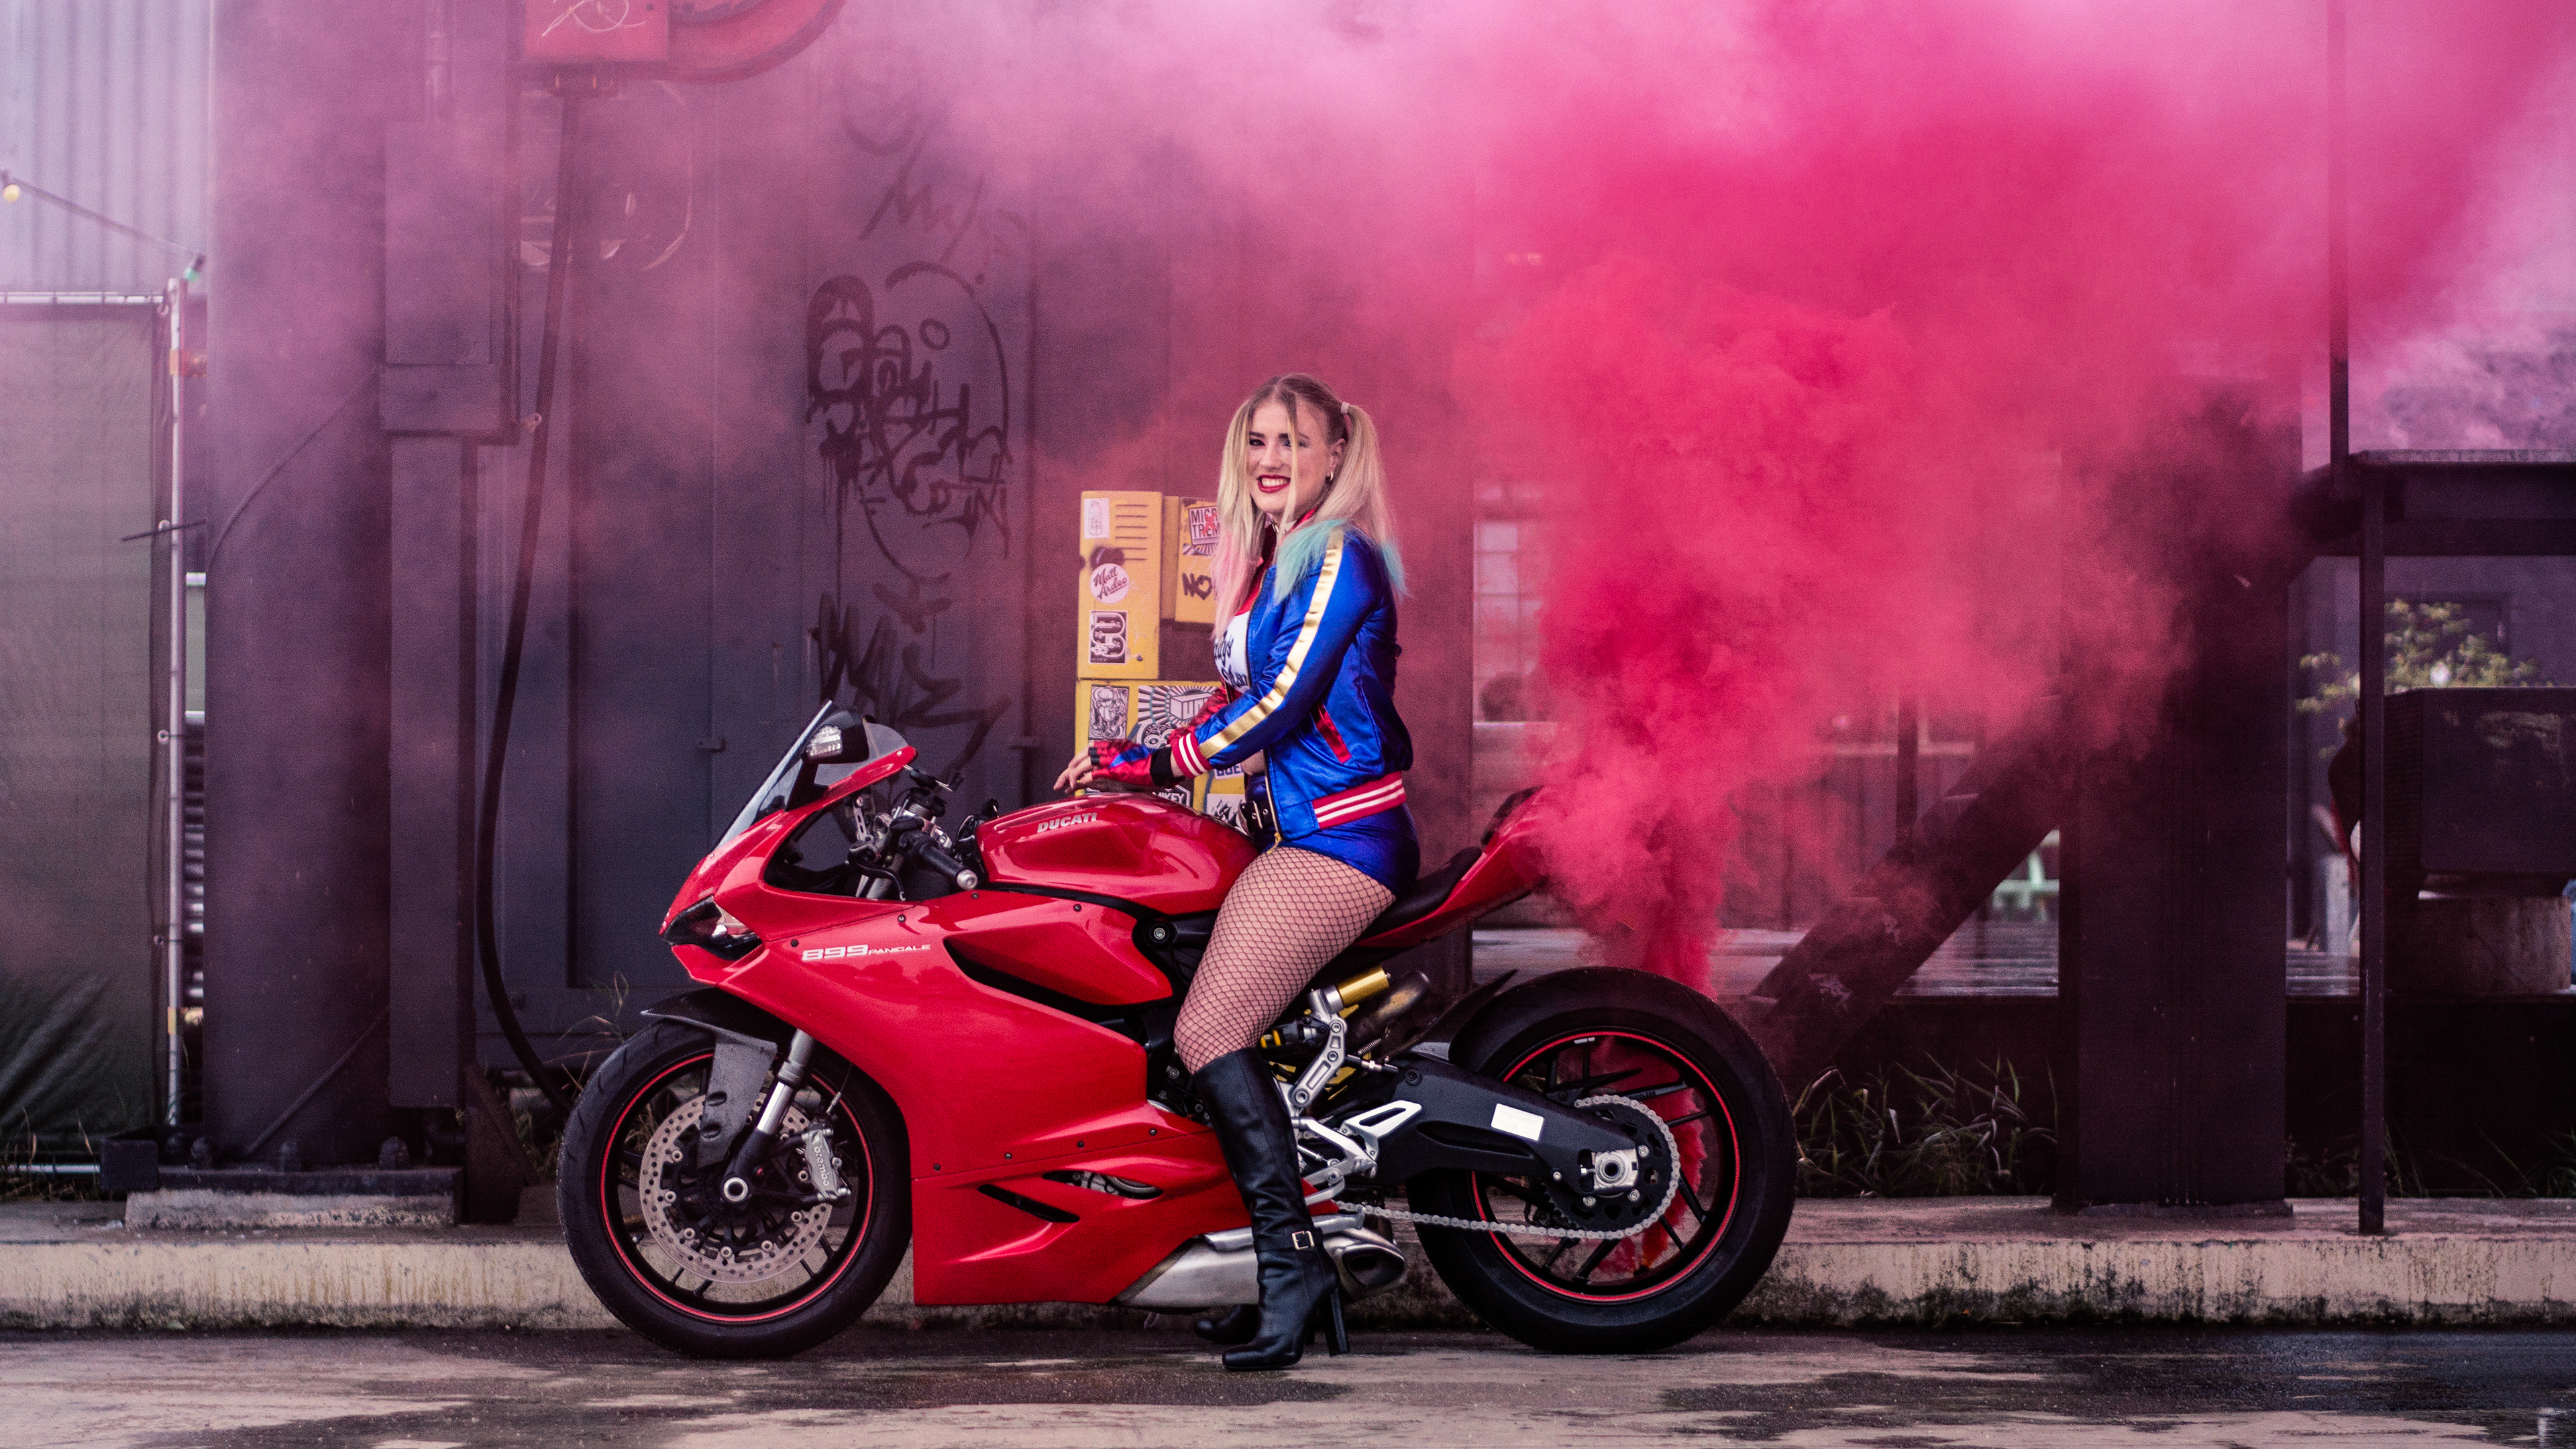 harley quinn on ducati cosplay 4k 1556184883 - Harley Quinn On Ducati Cosplay 4k - superheroes wallpapers, hd-wallpapers, harley quinn wallpapers, cosplay wallpapers, behance wallpapers, 4k-wallpapers